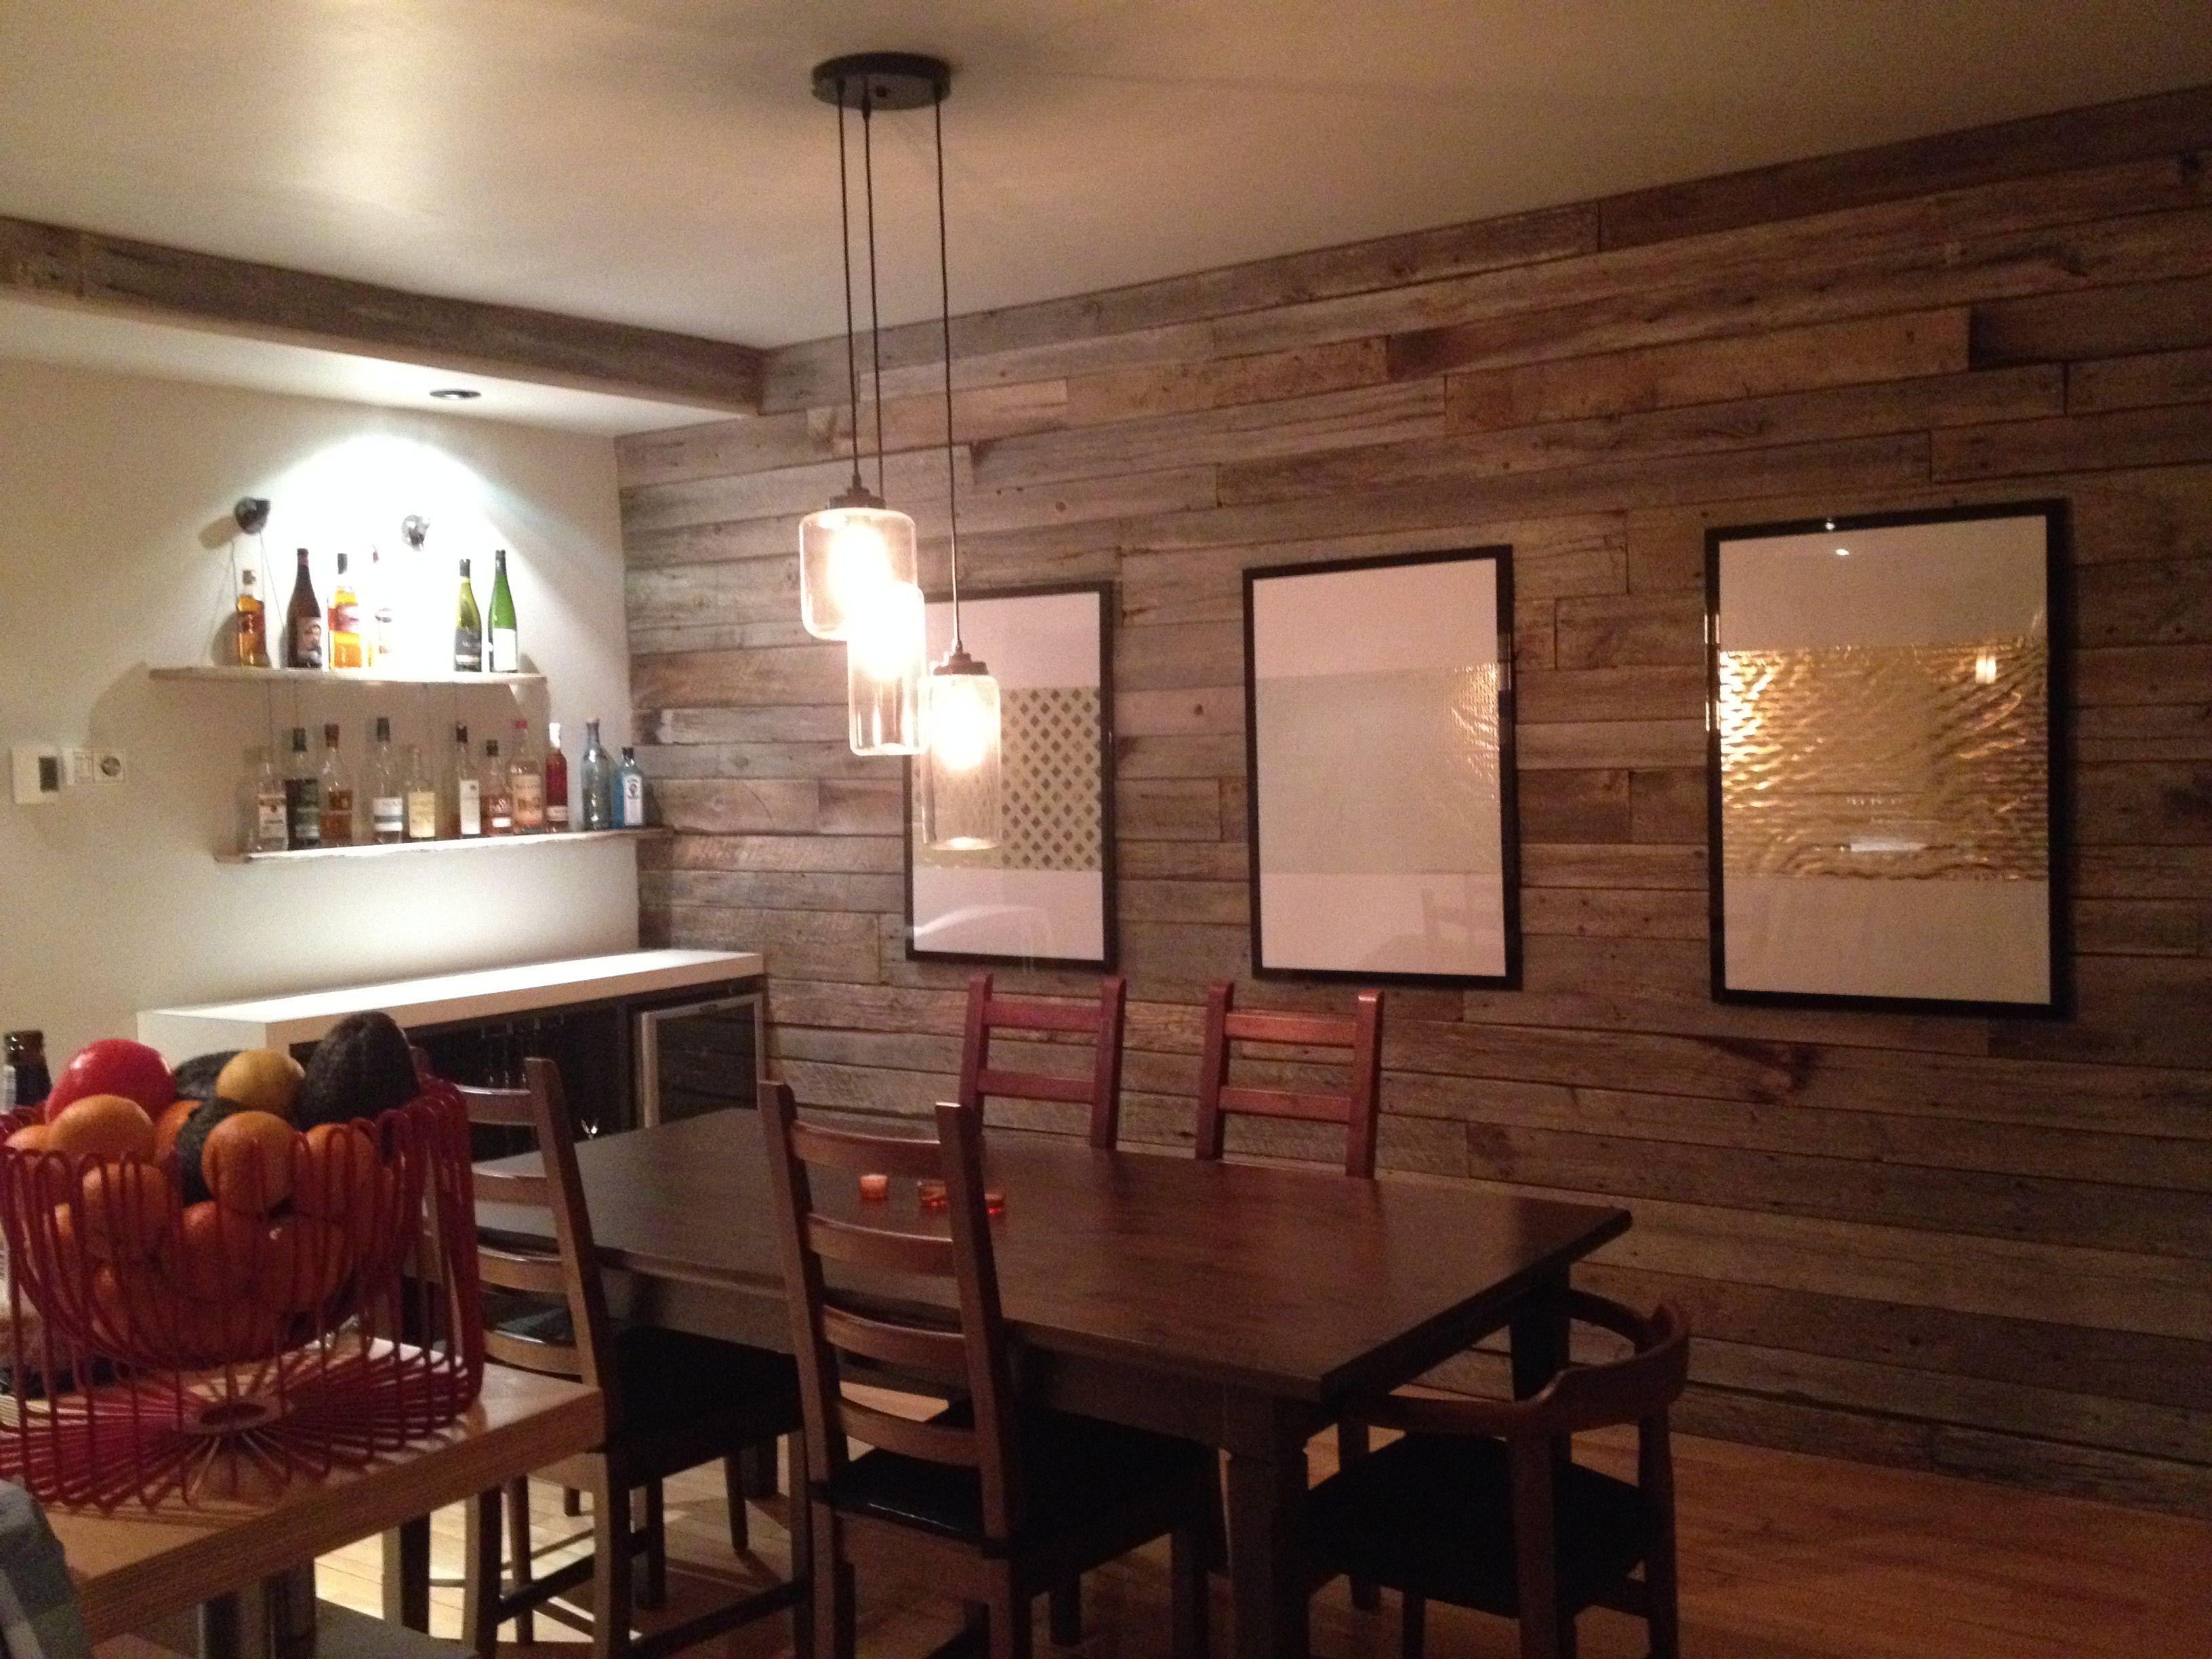 projet poulin salle manger festive pour no l. Black Bedroom Furniture Sets. Home Design Ideas